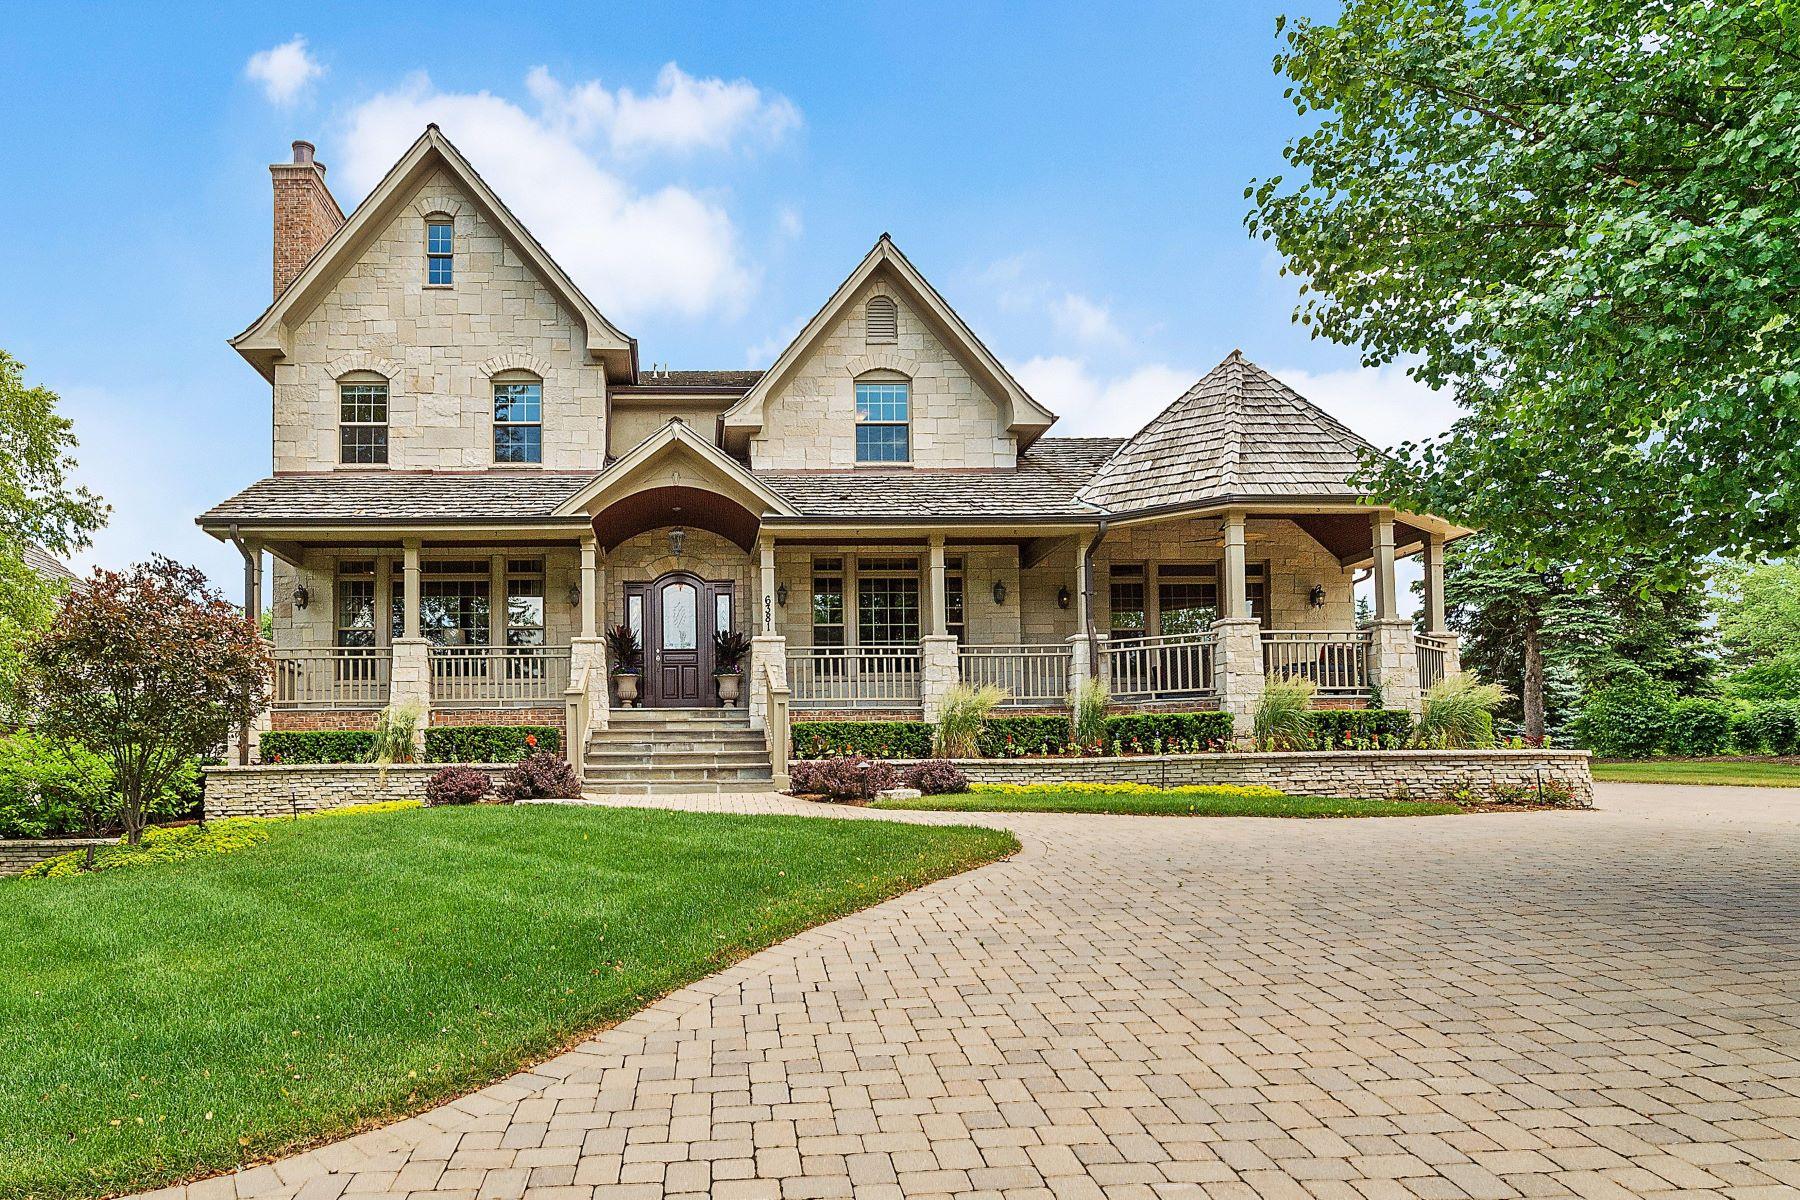 Property για την Πώληση στο Stunning Stone Estate 6381 S Garfield Avenue, Burr Ridge, Ιλινοϊσ 60527 Ηνωμένες Πολιτείες